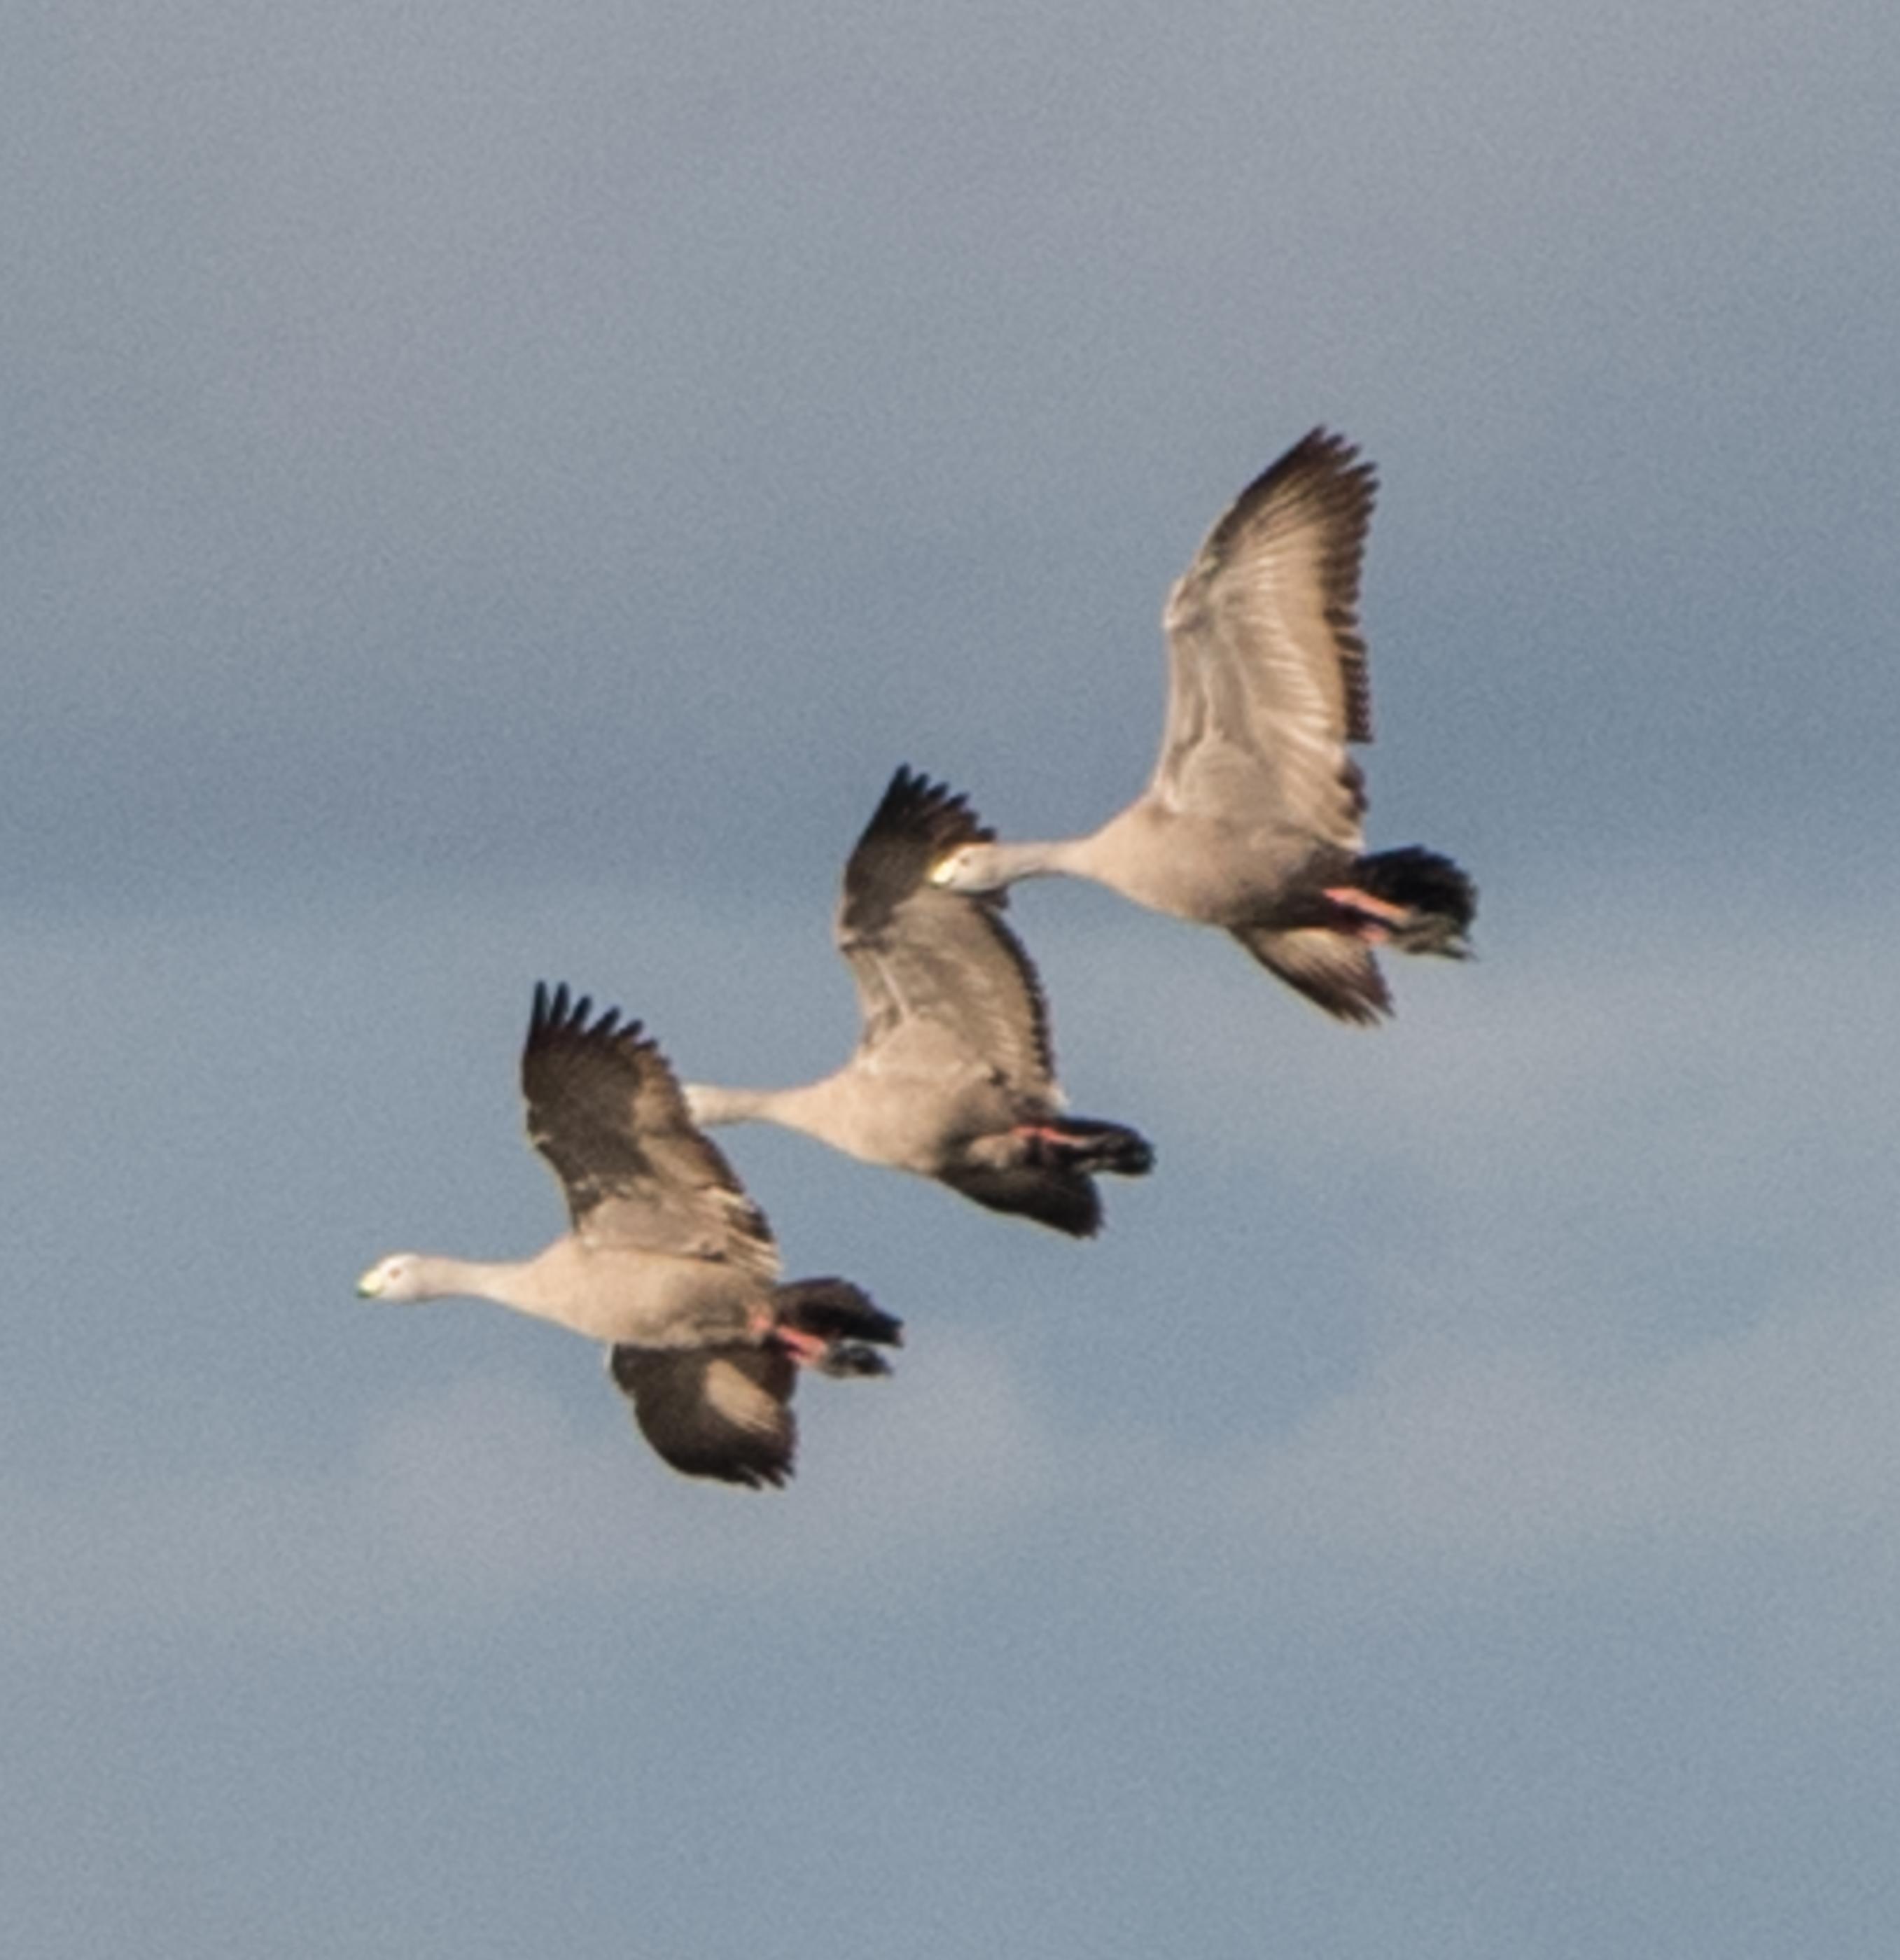 Cape Barren geese at dusk south australia